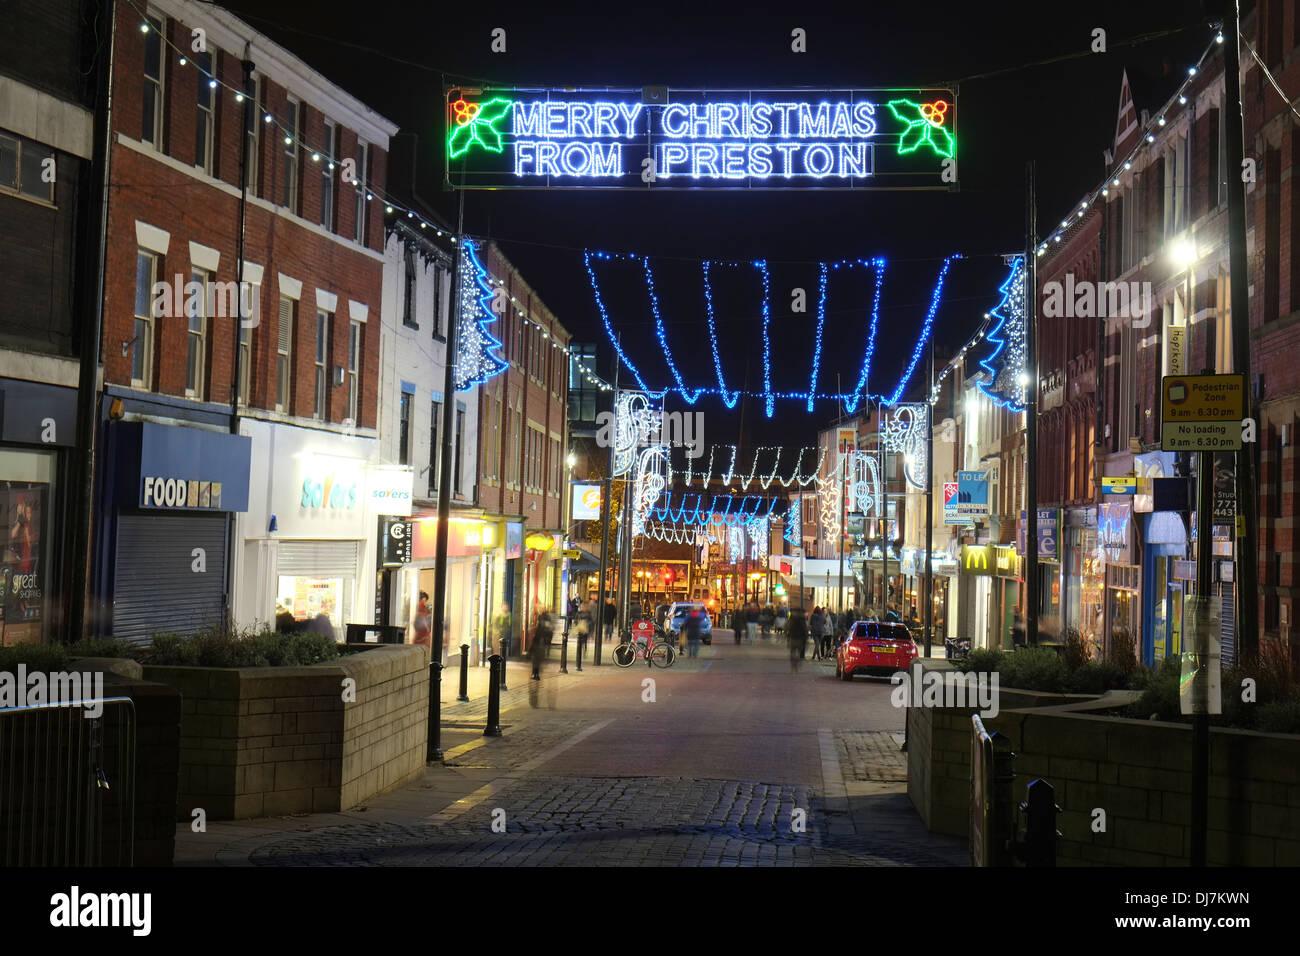 Preston Christmas Lights Stock Photos & Preston Christmas Lights ...